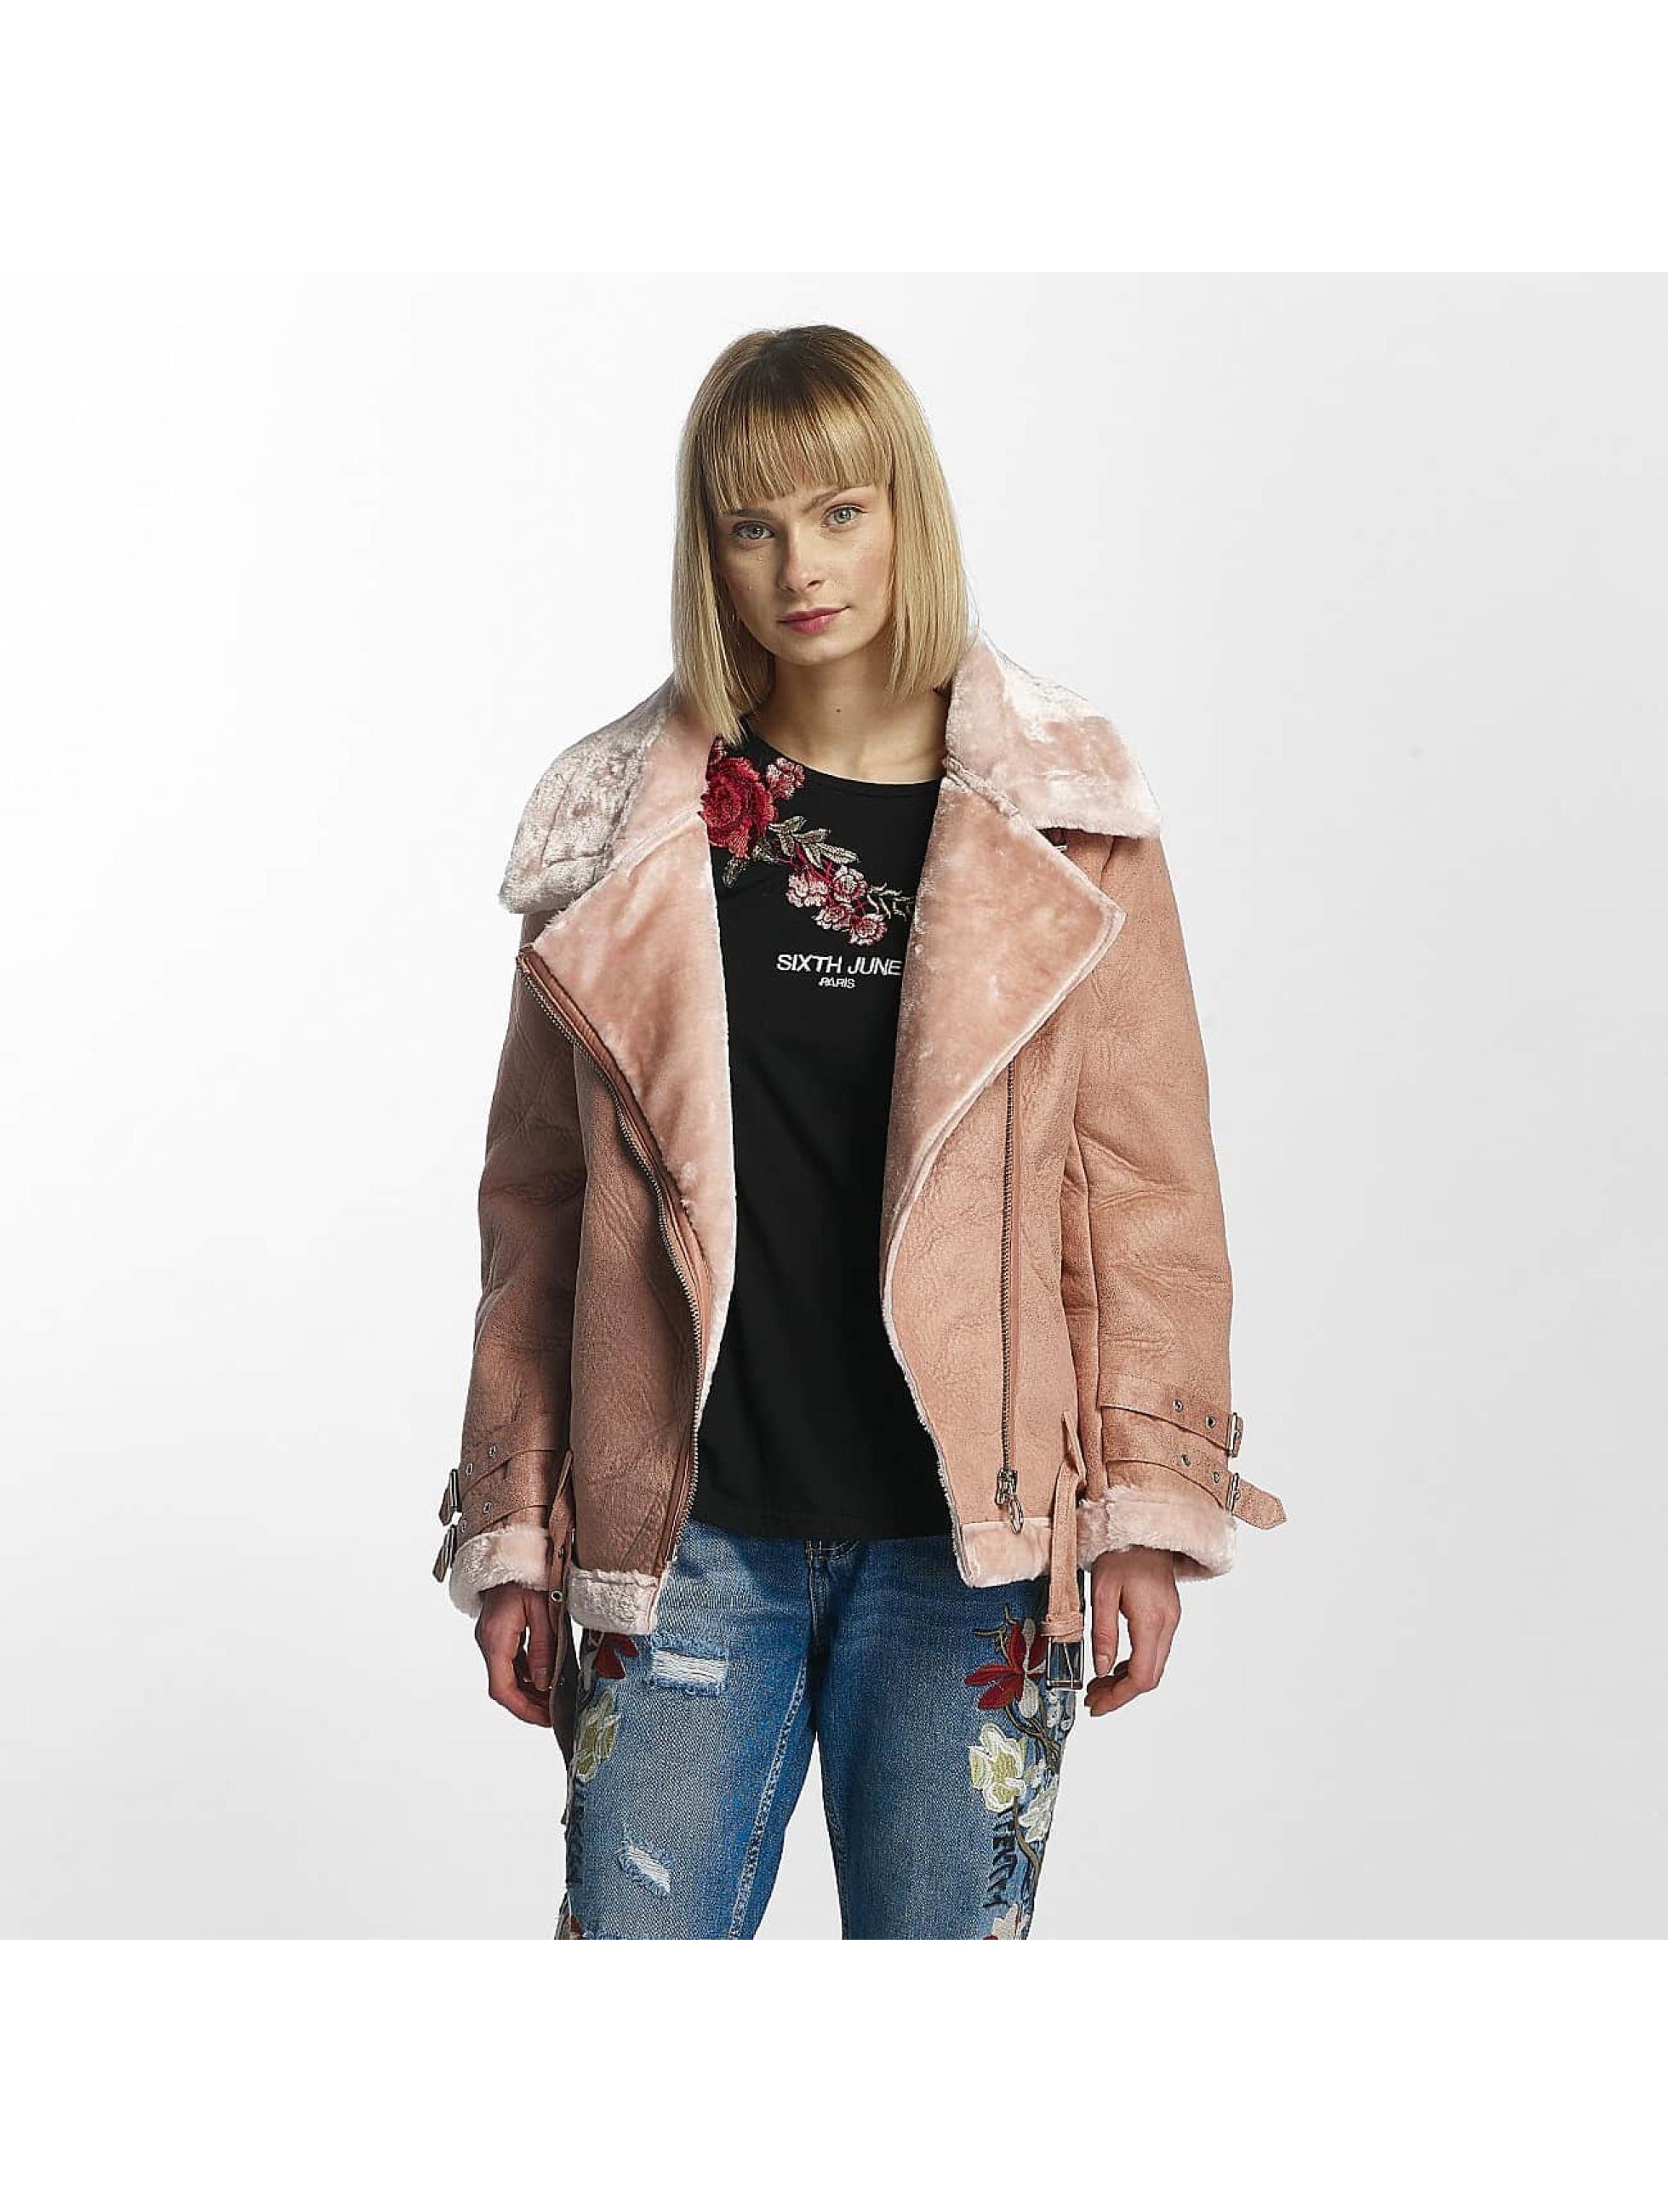 Sixth June Frauen Lederjacke Perfecto Fur in rosa